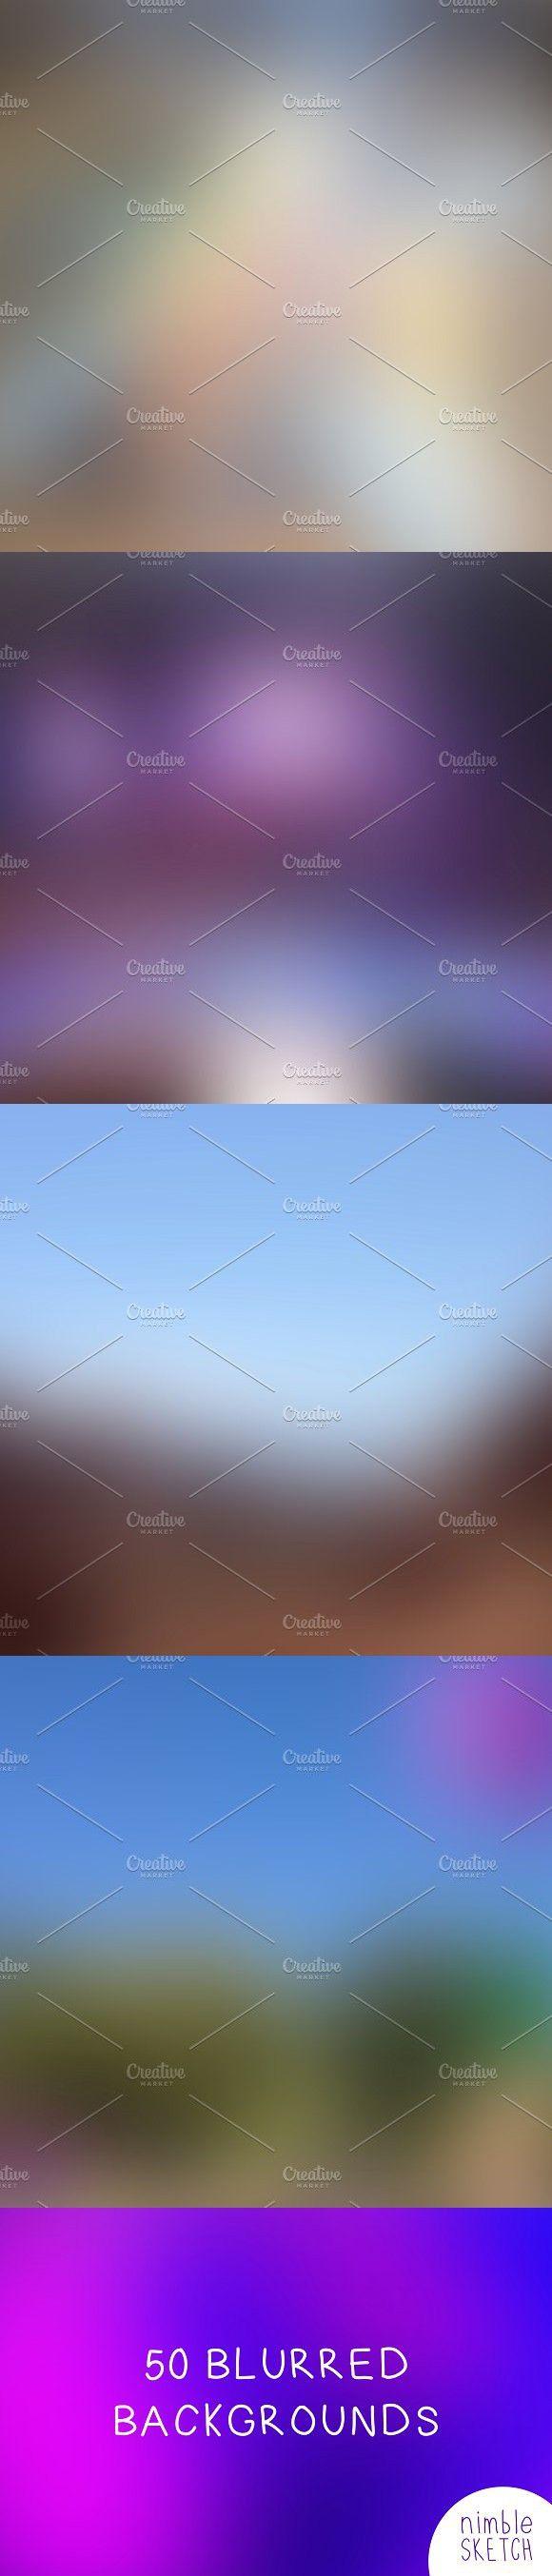 50 Blurred Backgrounds. Wallpaper #backgrounds #blurred